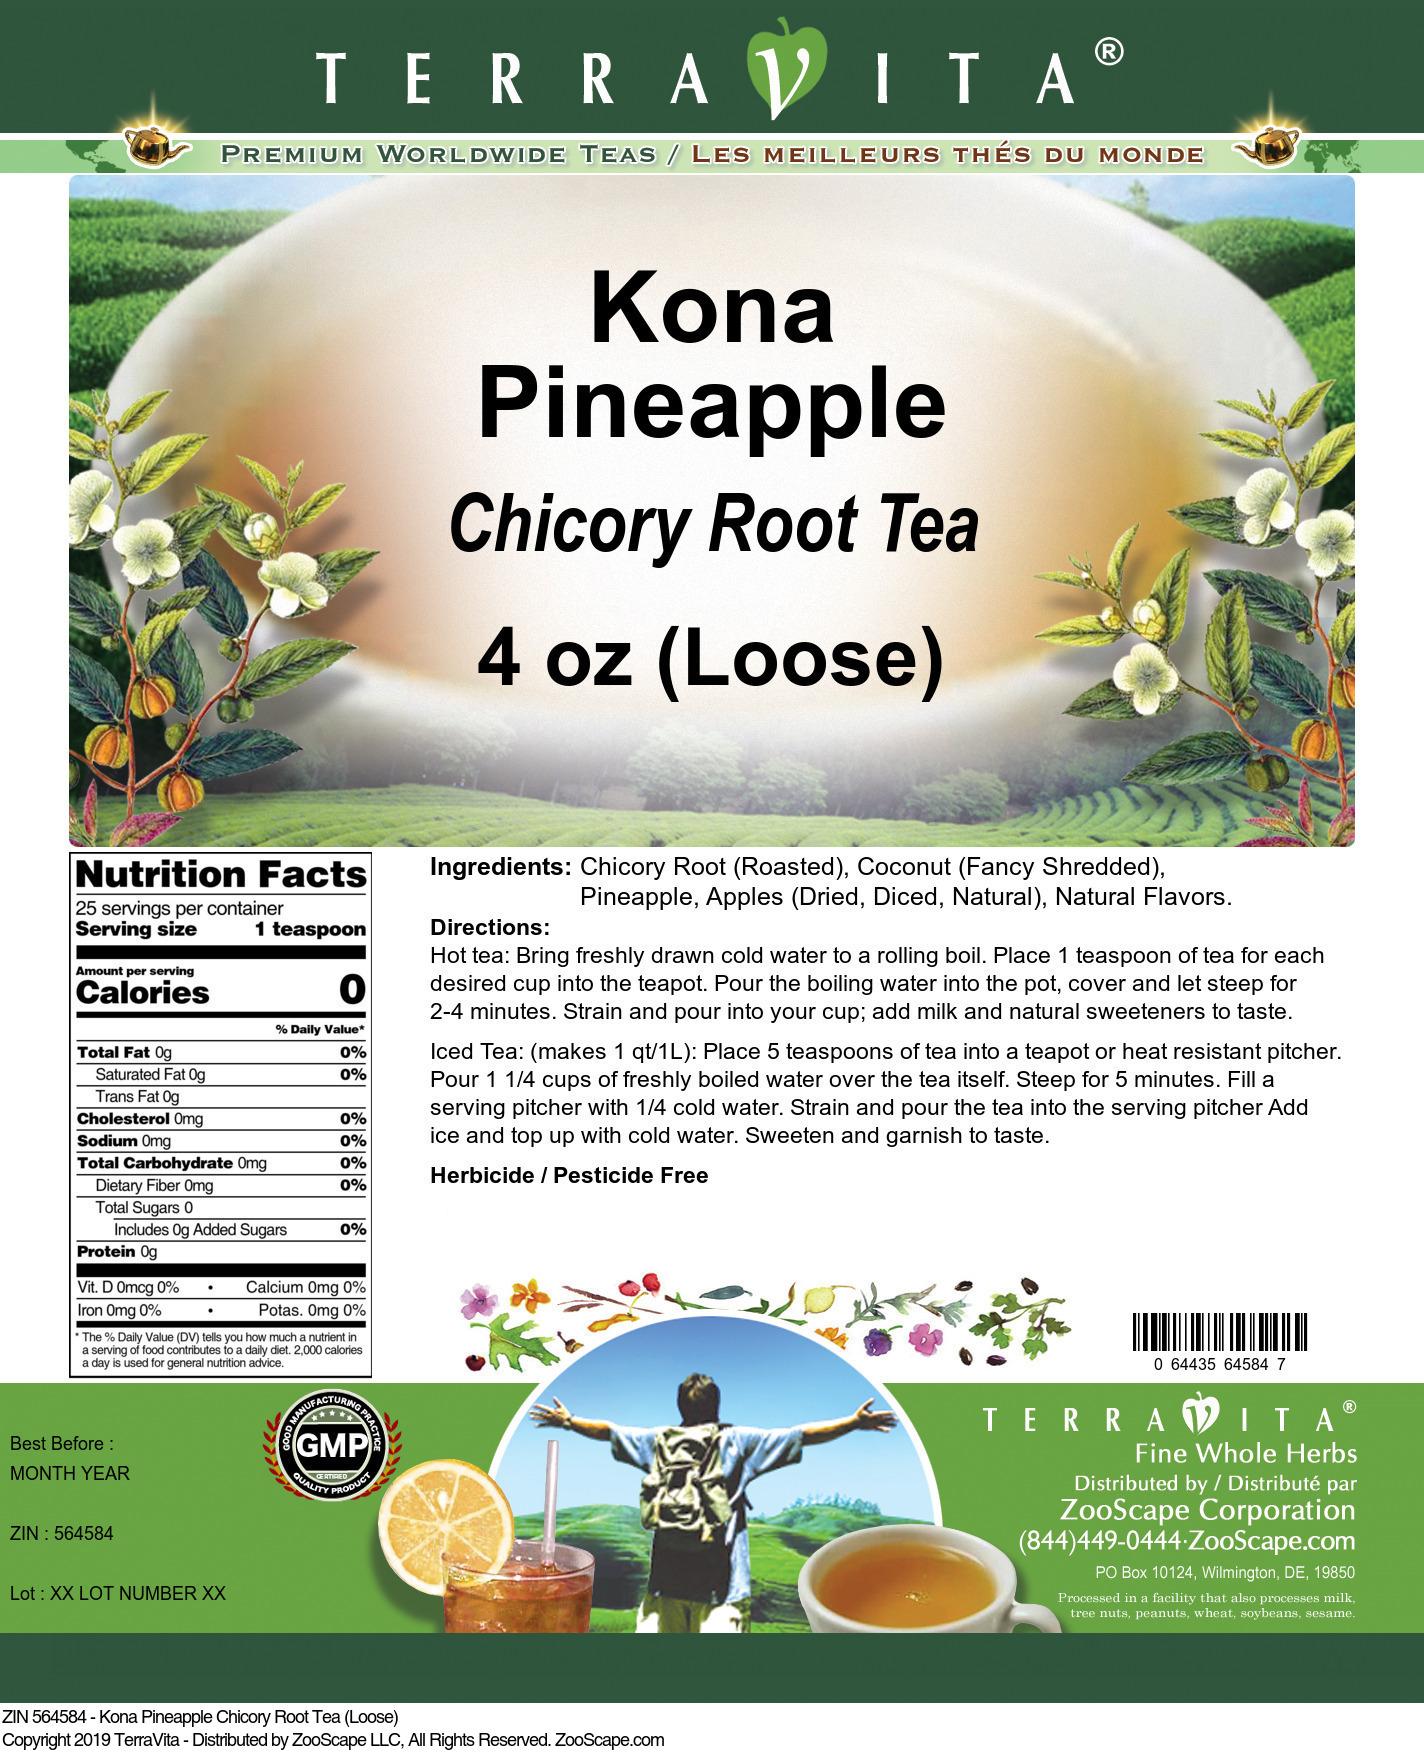 Kona Pineapple Chicory Root Tea (Loose)